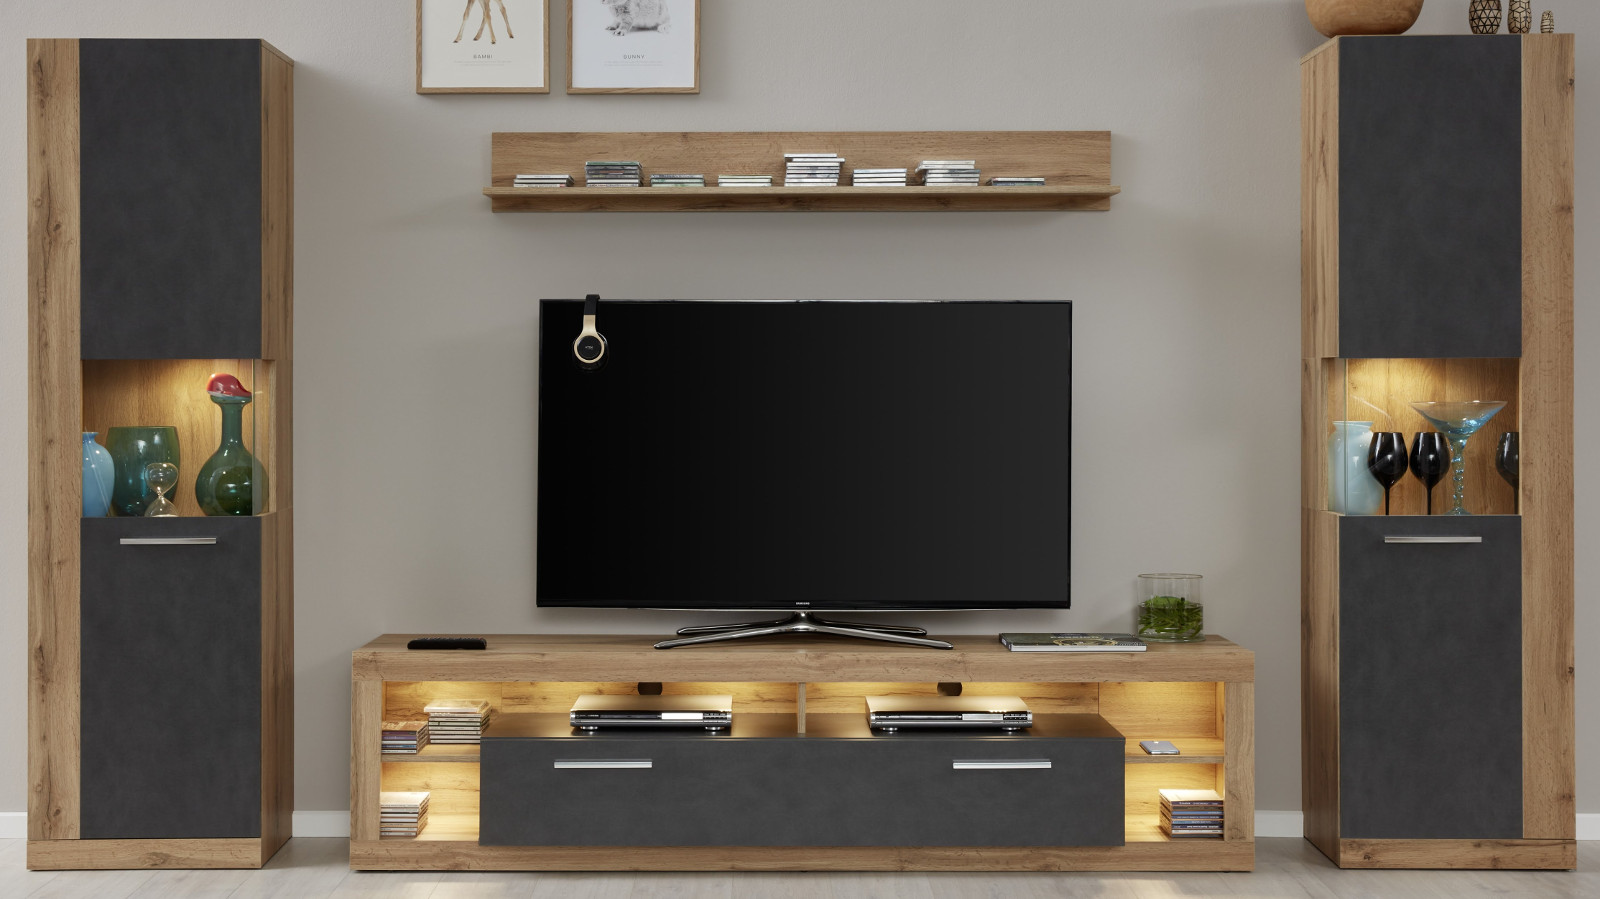 mulltonnenbox holz mit ruckwand. Black Bedroom Furniture Sets. Home Design Ideas